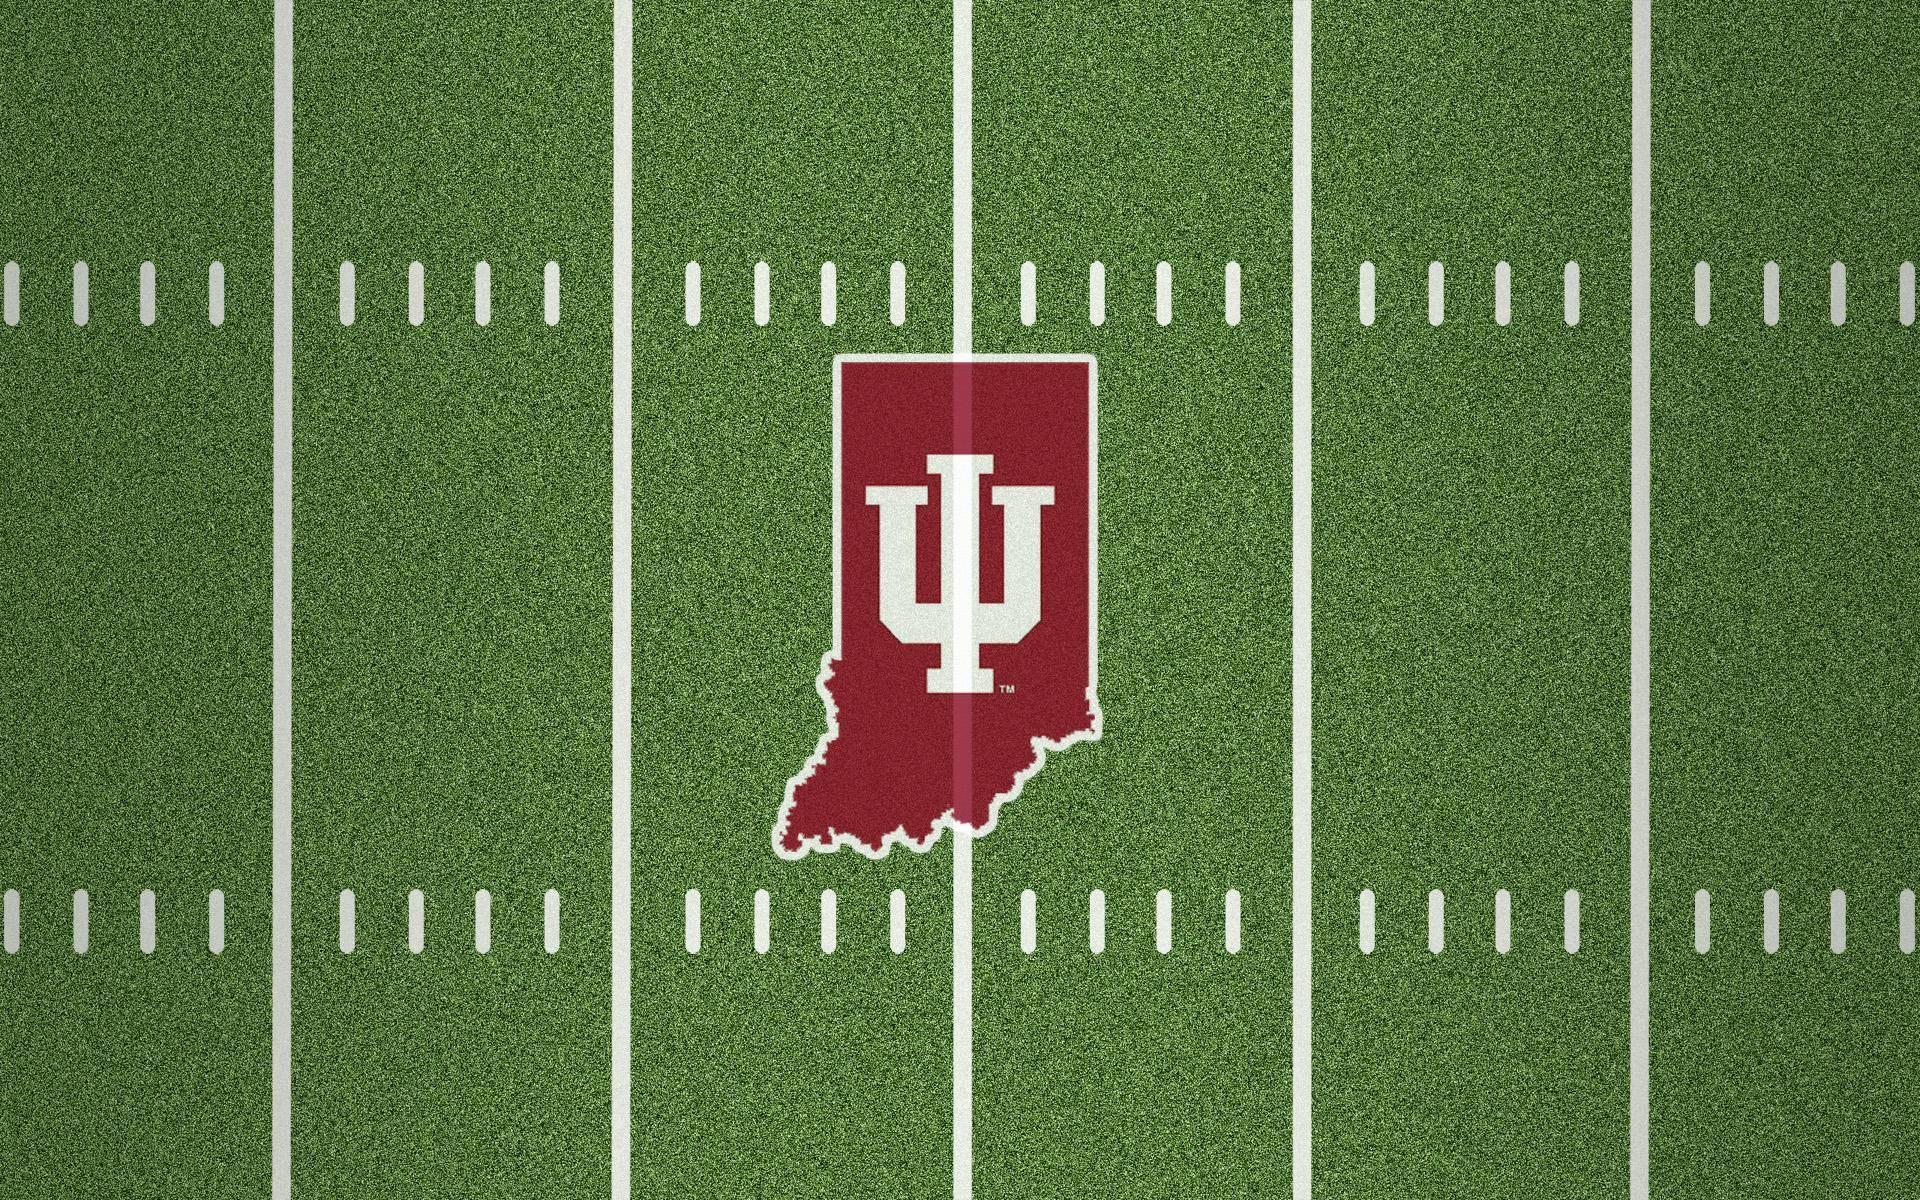 Indiana University Wallpapers 1920x1200